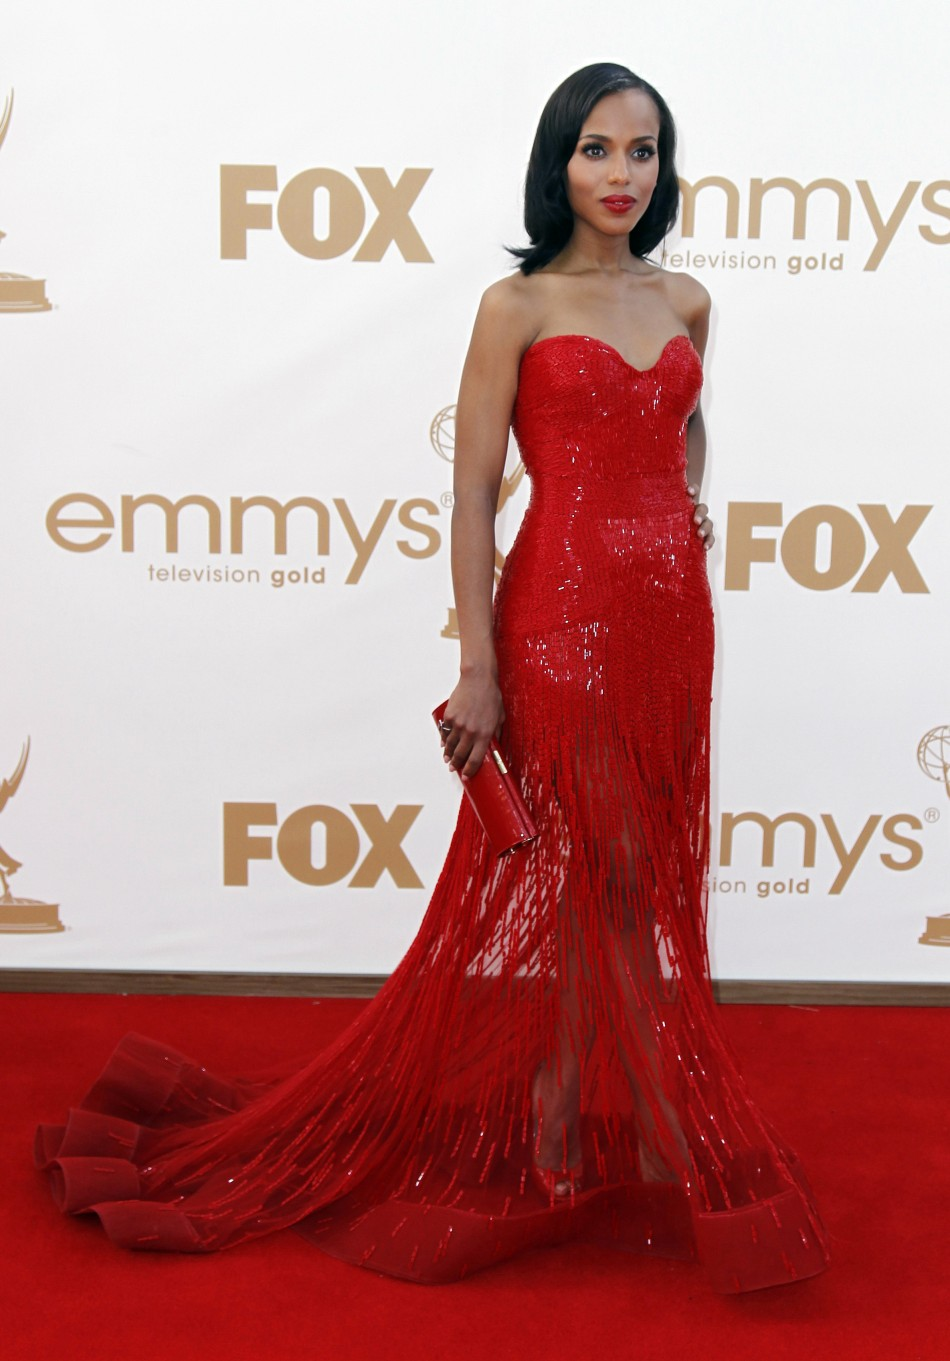 Emmy Awards 2011: Stunning Celebrities in Ravishing Red.